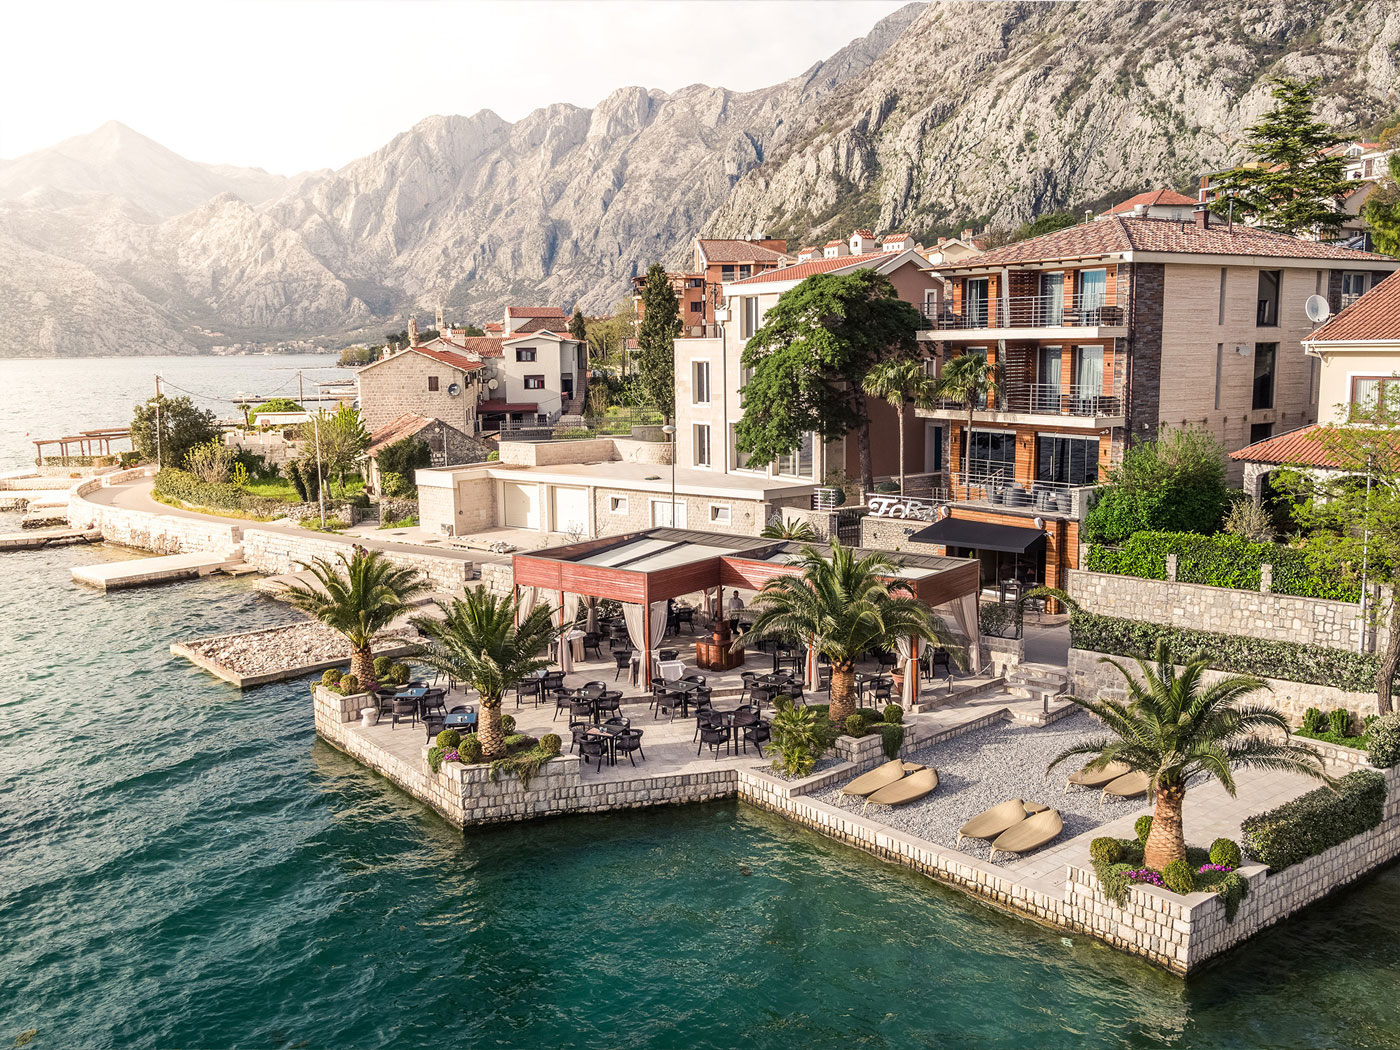 Top 3 Boutique Hotels in Montenegro